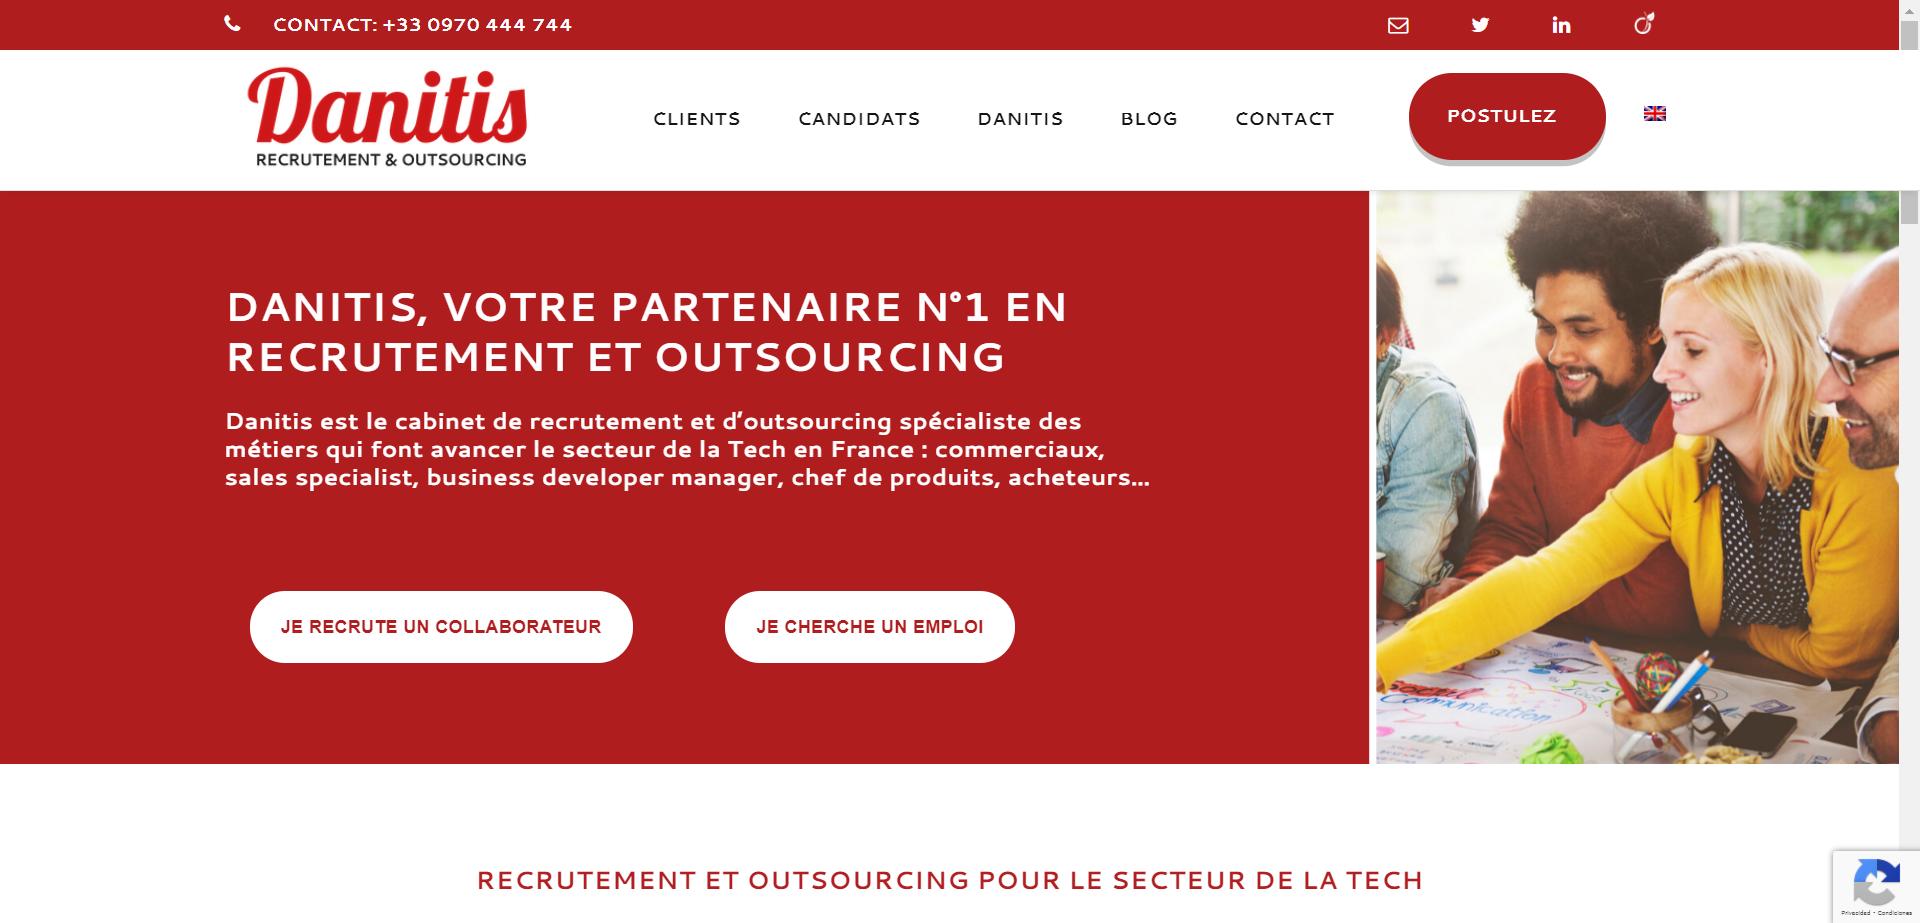 Danitis Recrutement & Outsourcing